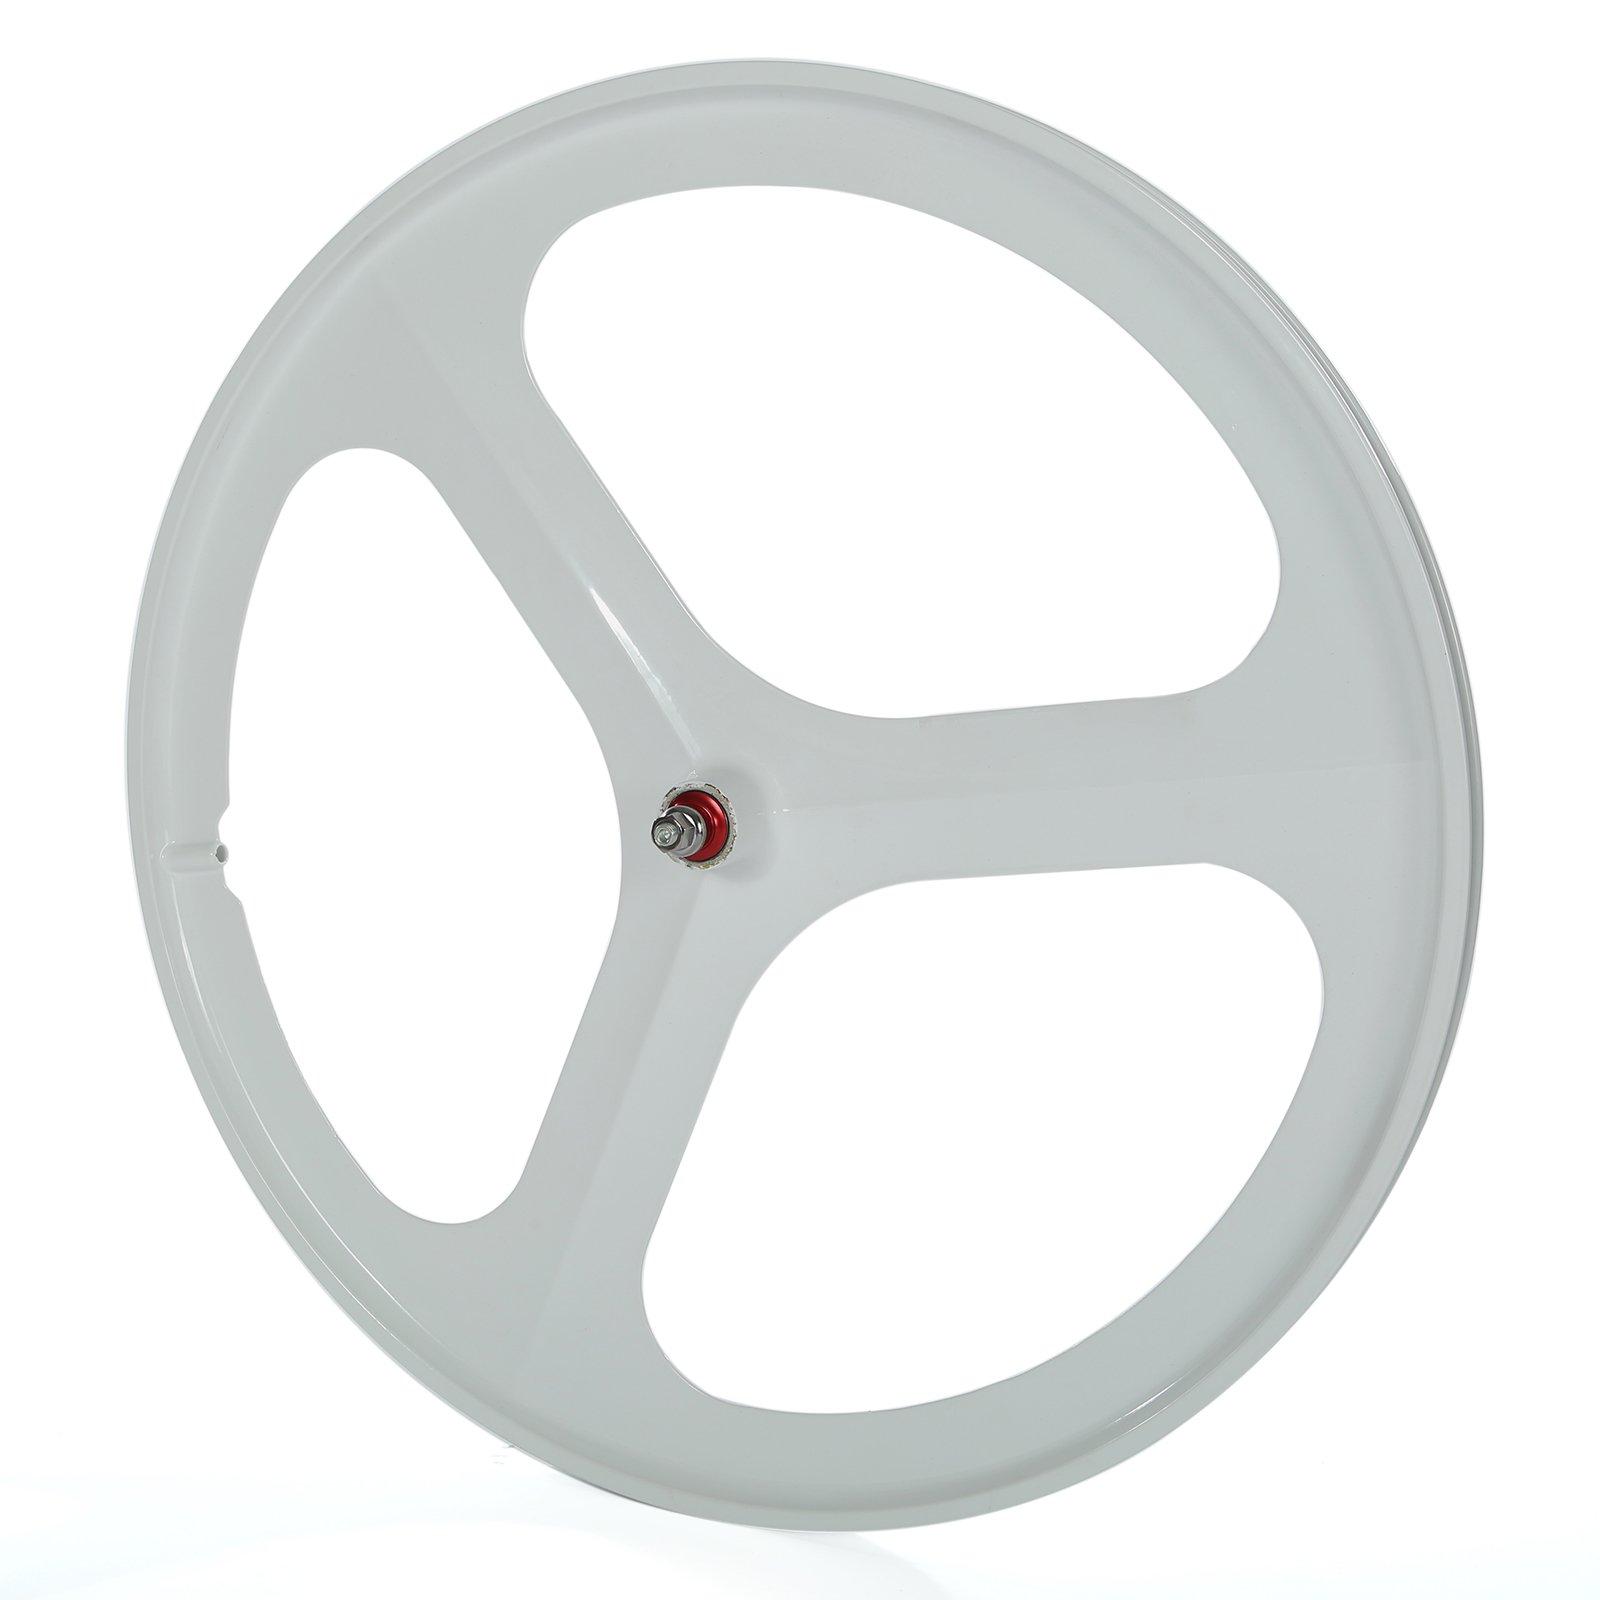 SOLOMONE CAVALLI SC Fixed Gear 700c Tri Spoke Rim Front Rear Single Speed Fixie Bicycle Wheel Set by SOLOMONE CAVALLI